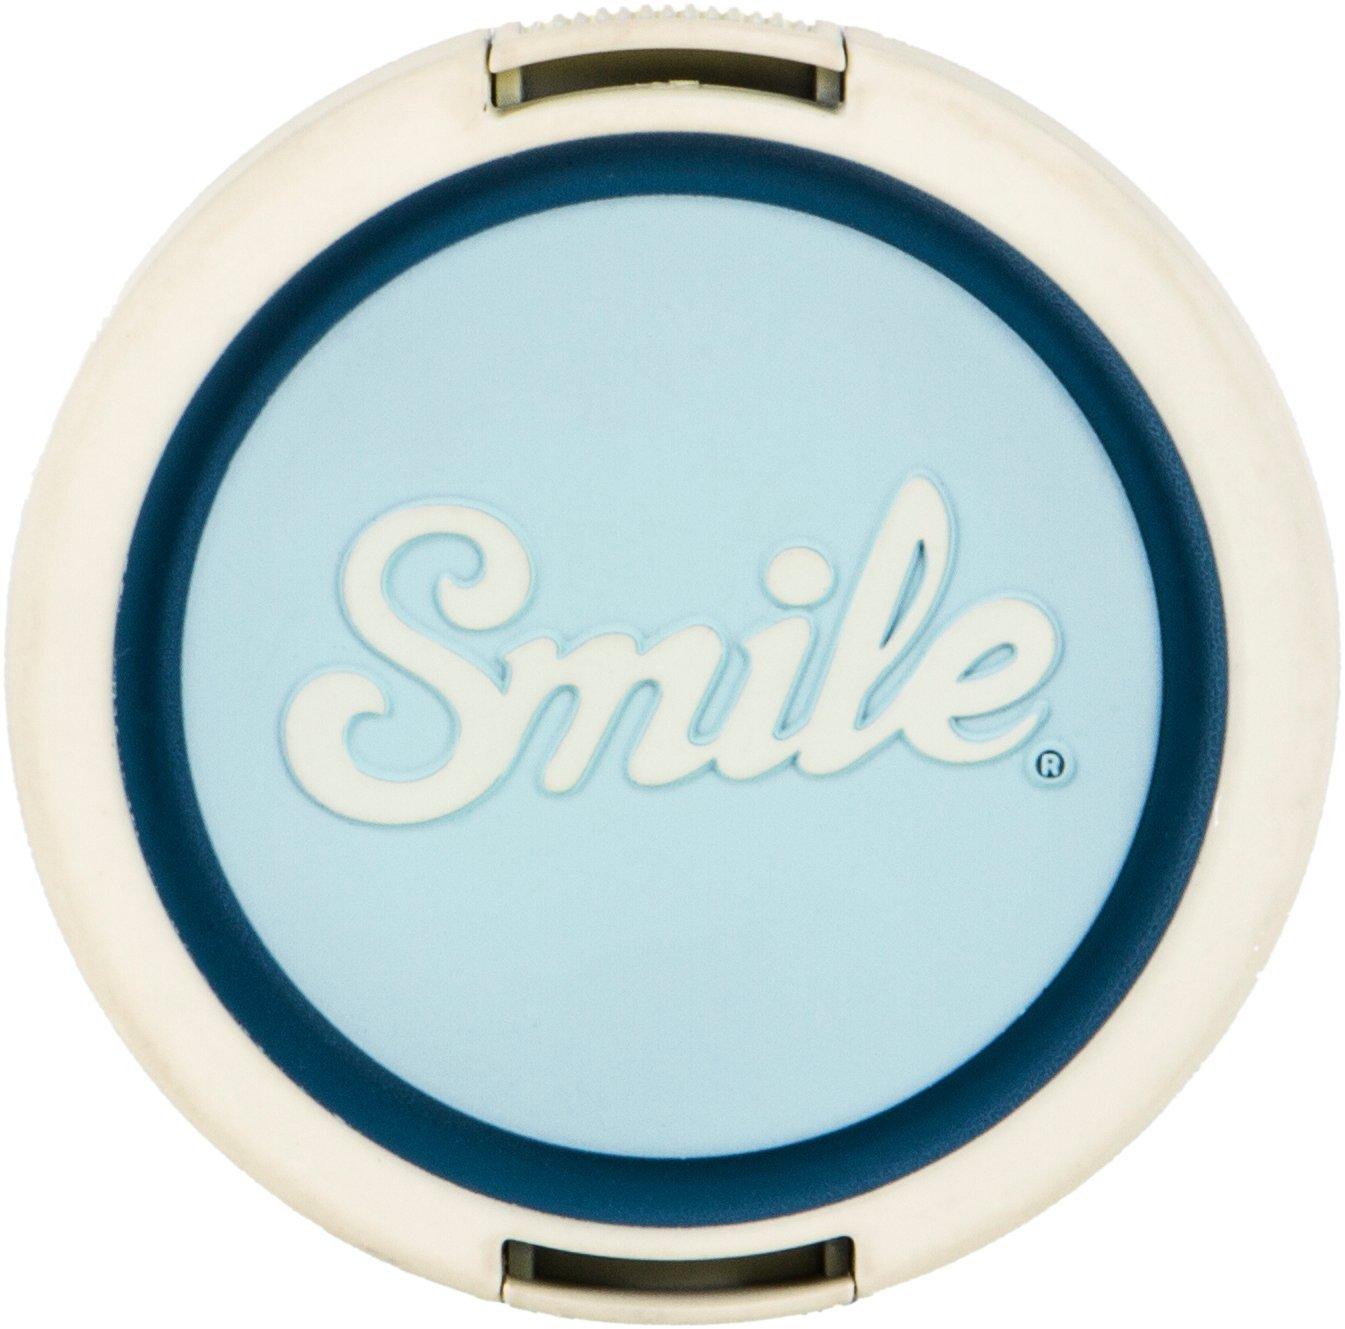 Smile 67mm Atomic Age Lens Cap for Camera